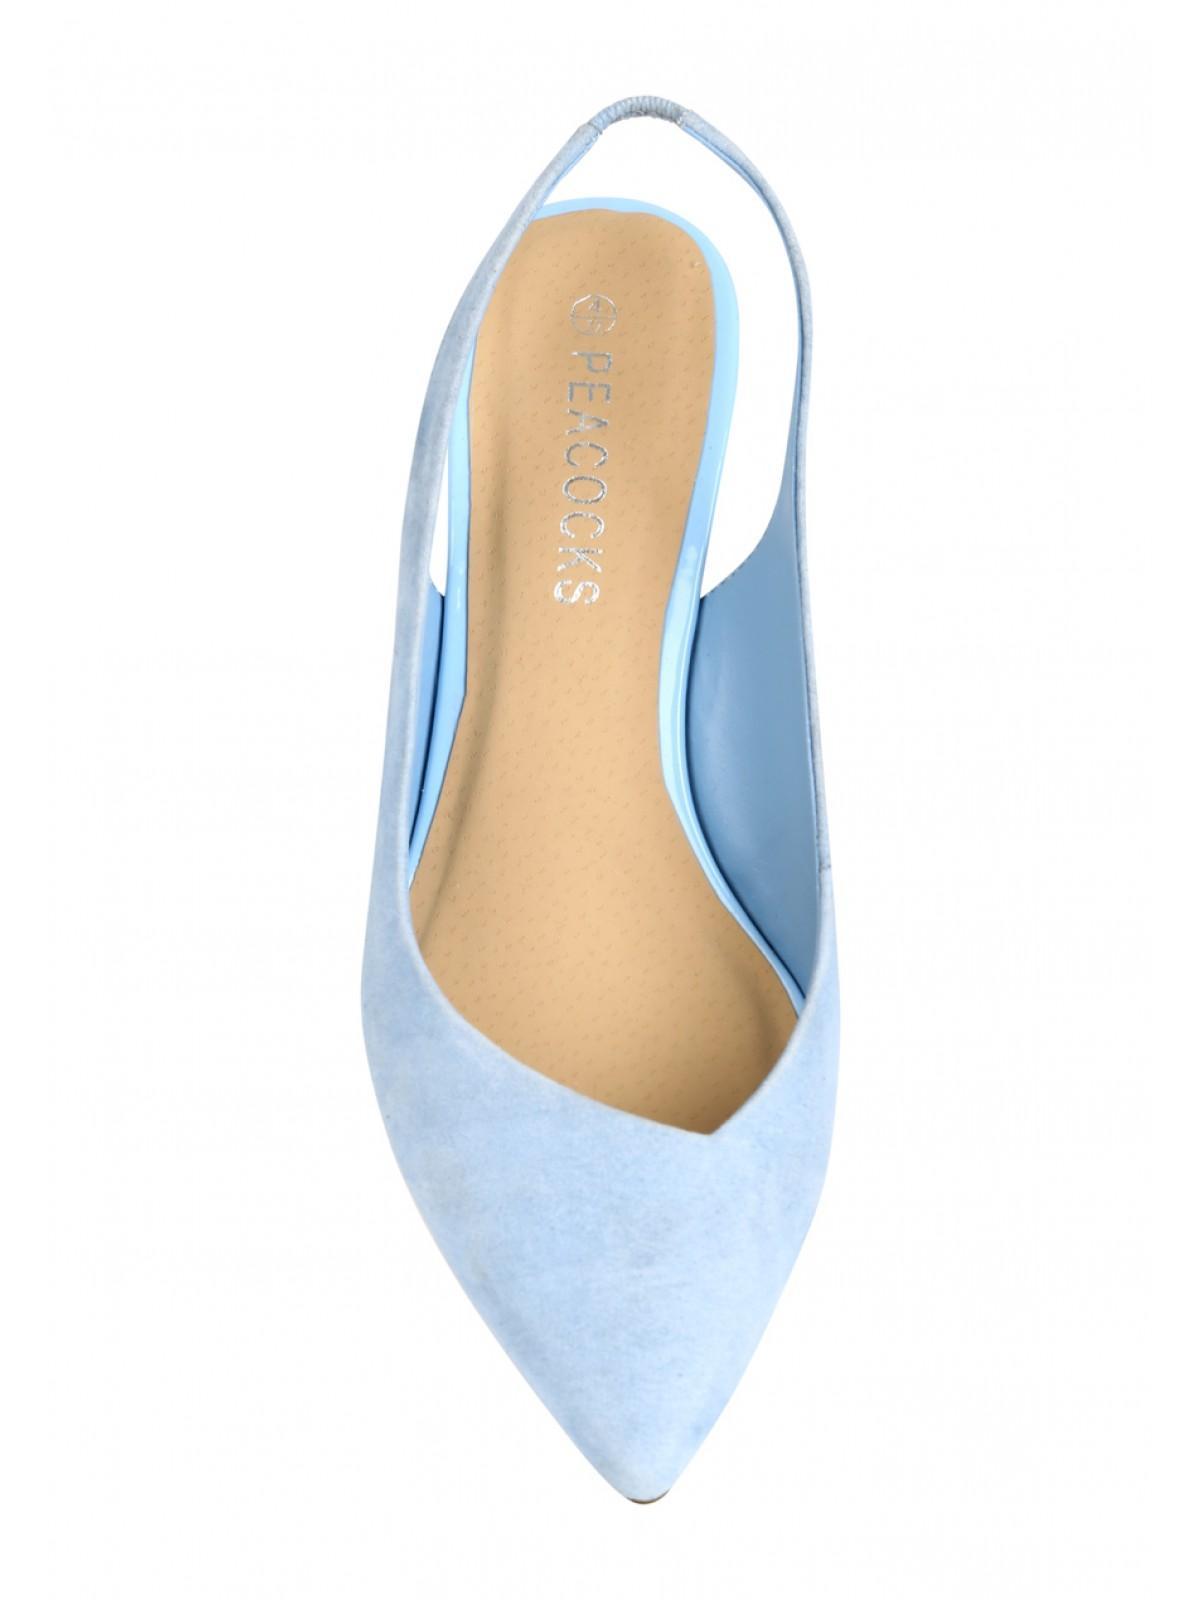 Womens Kitten Heel Slingback Shoes | Peacocks